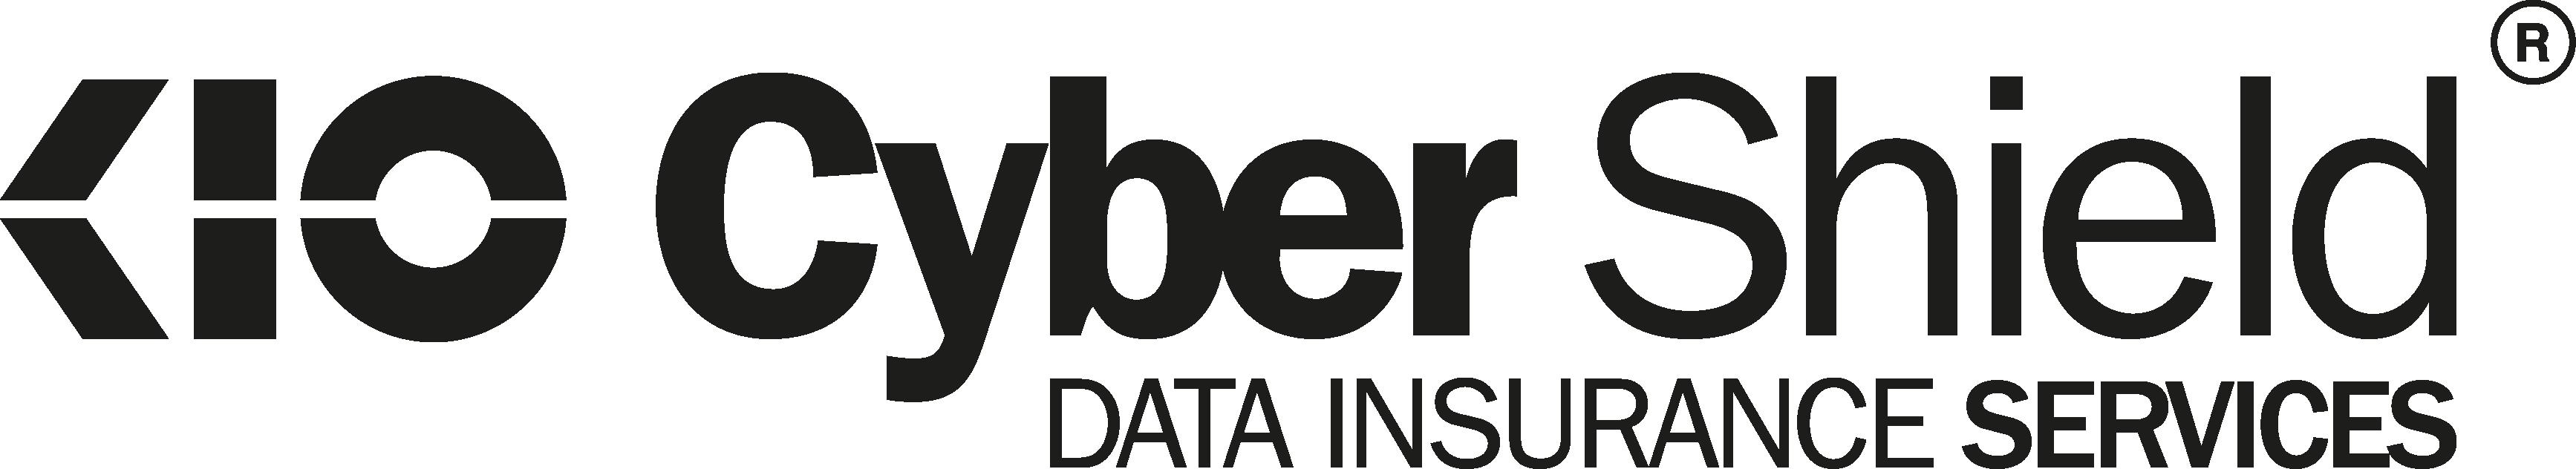 KIO_cyber_shield_logo_Mesa de trabajo 1